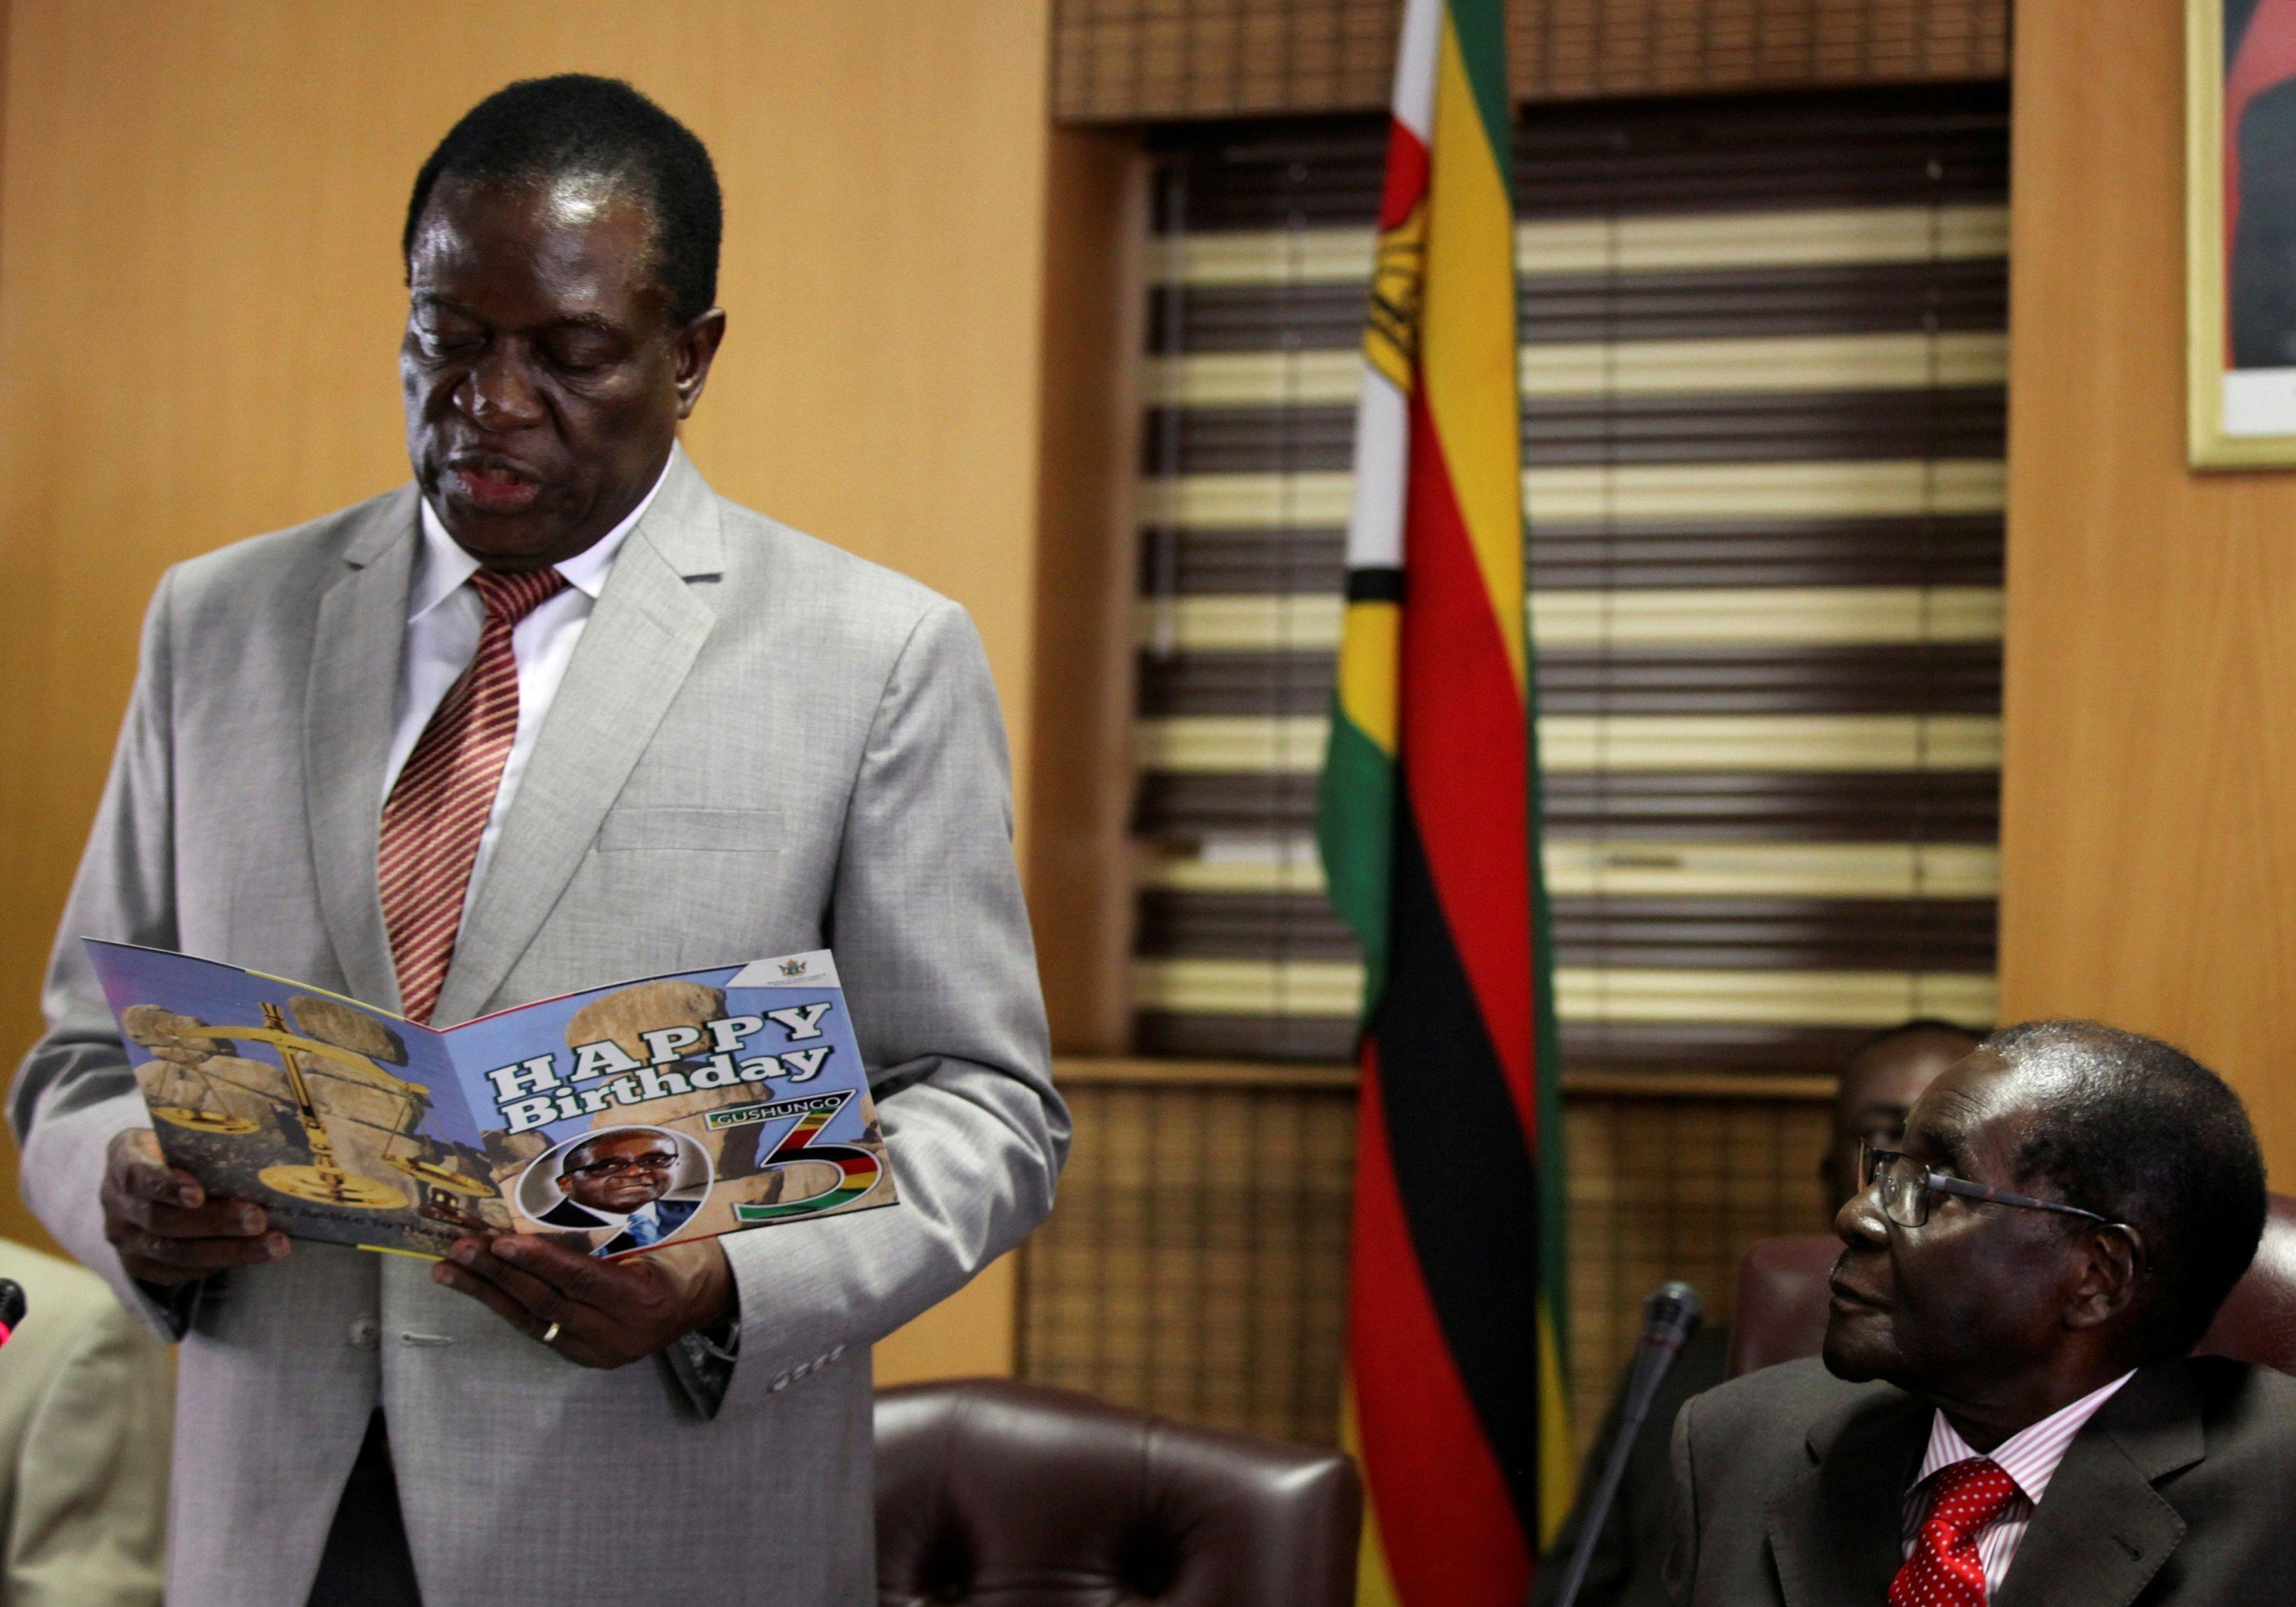 Des félicitations au Président zimbabwéen Robert Mugabé